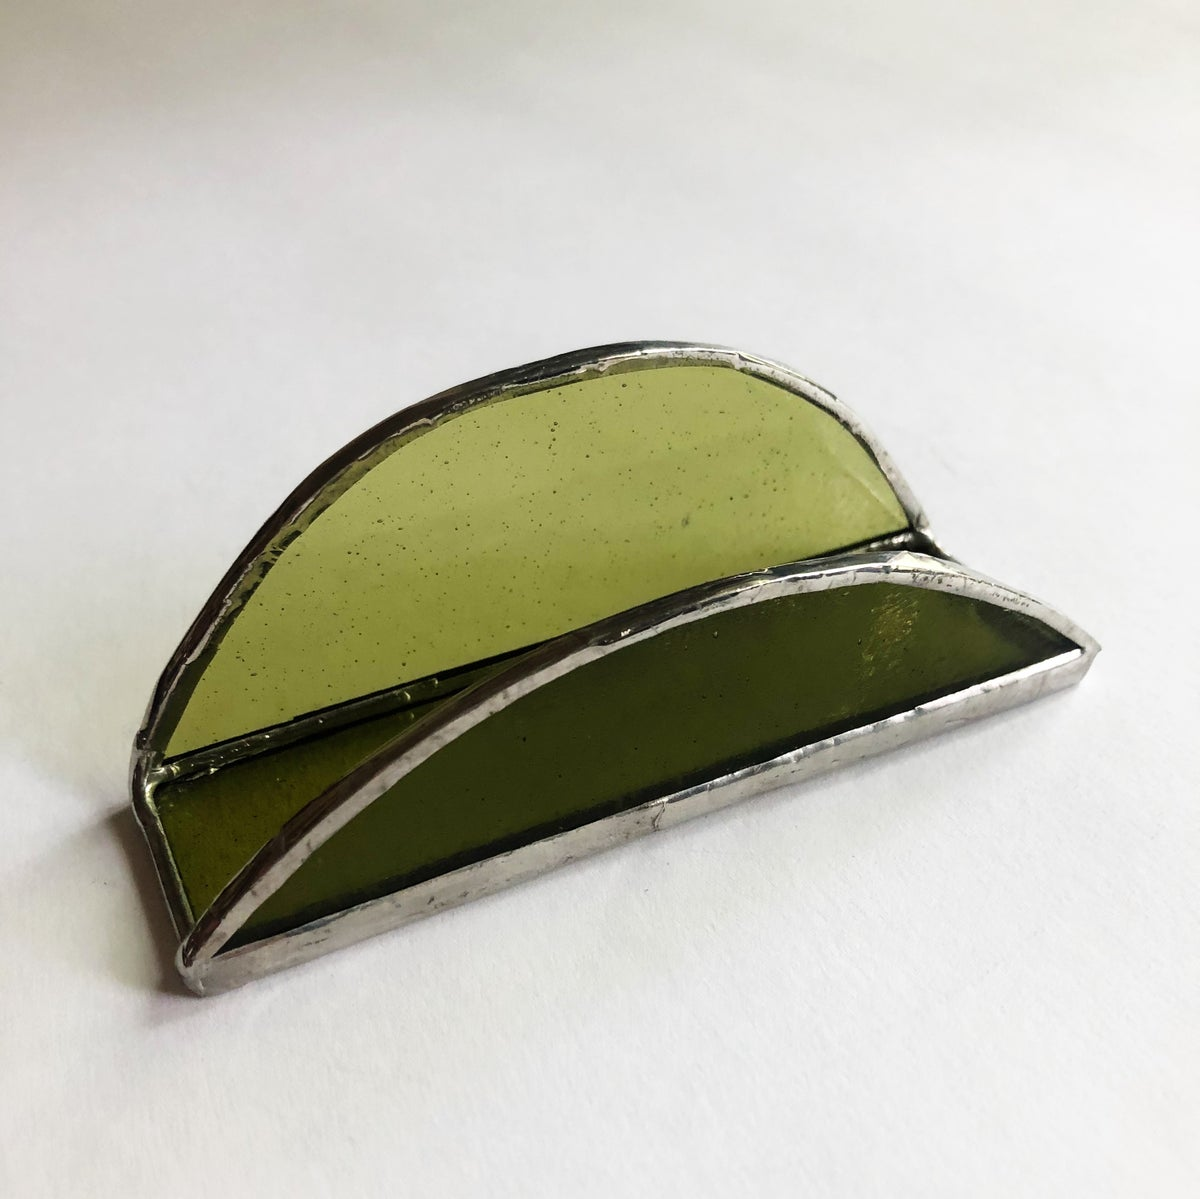 Image of Moss Green Cardholder